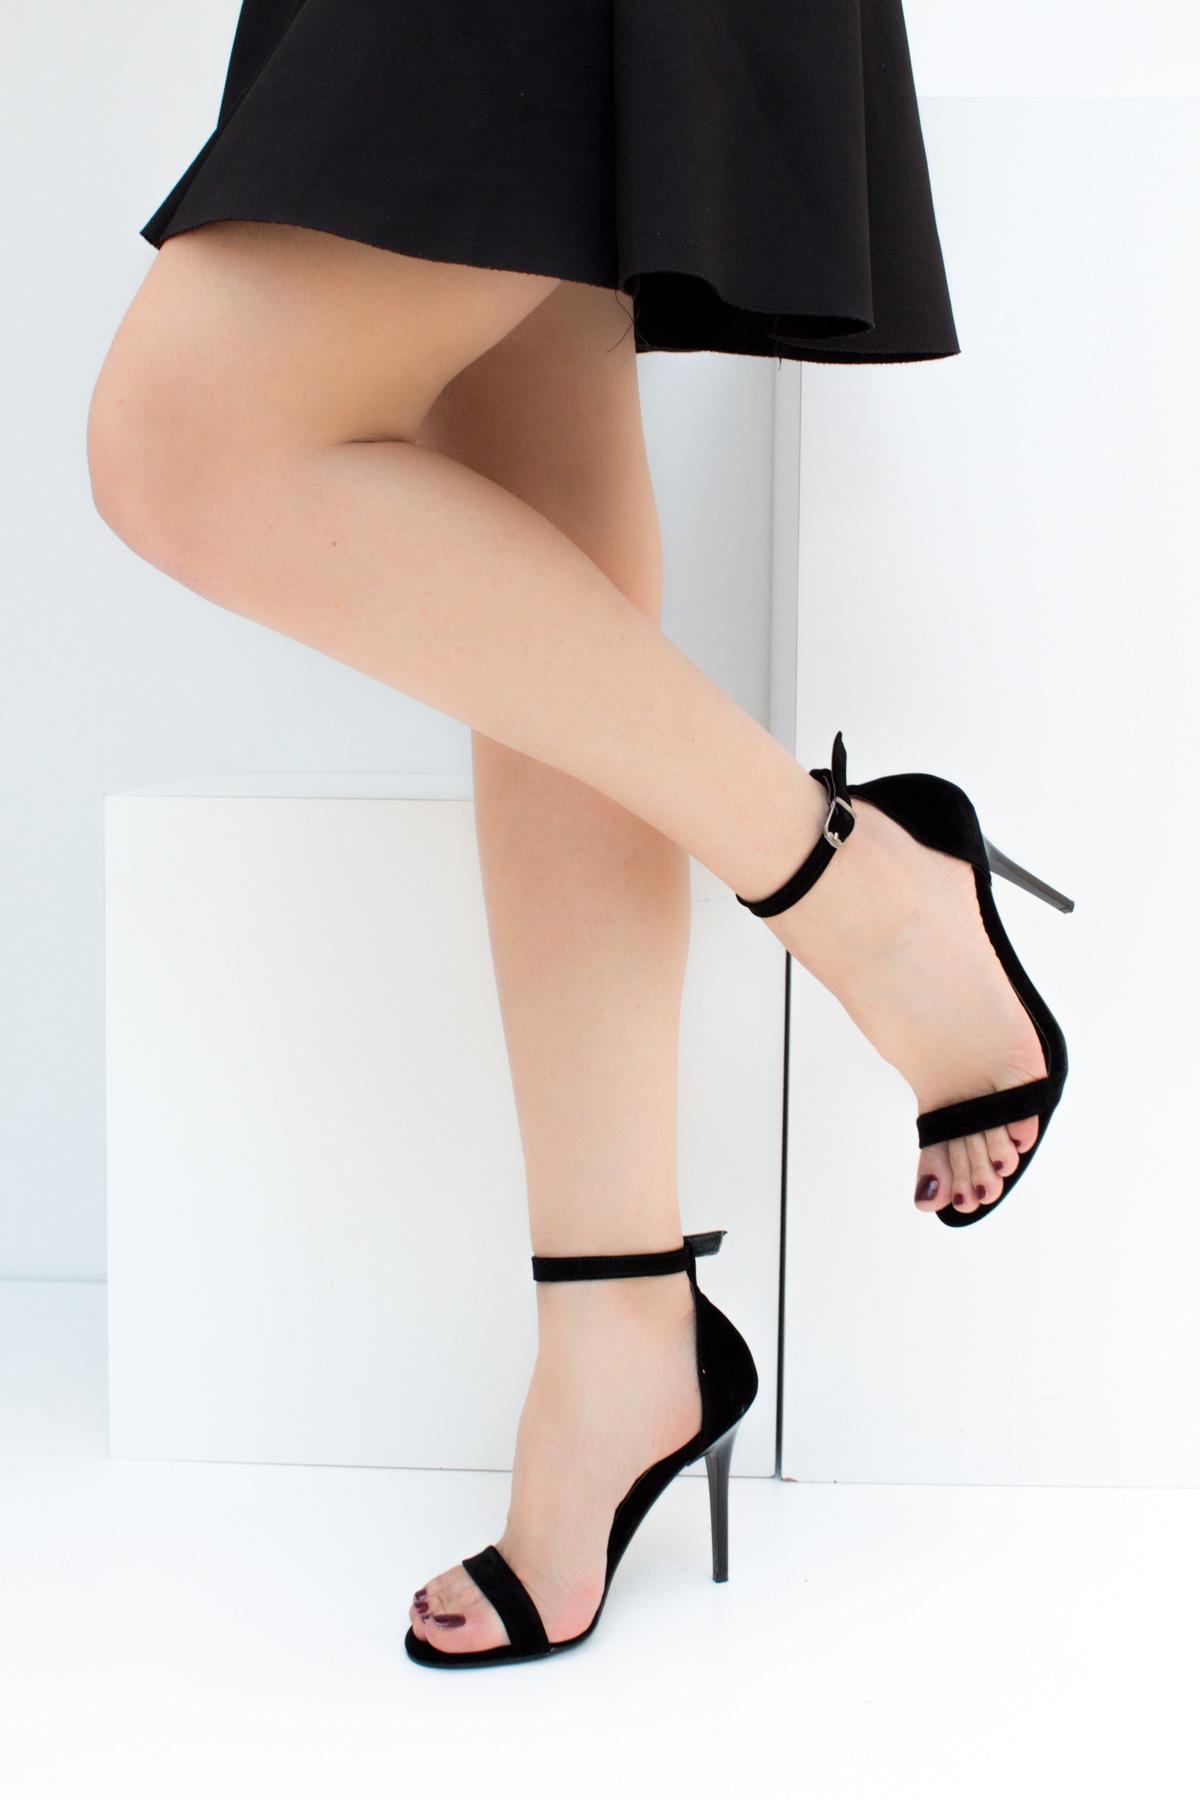 Fox Shoes Siyah Kadın Topuklu Ayakkabı B922112602 1